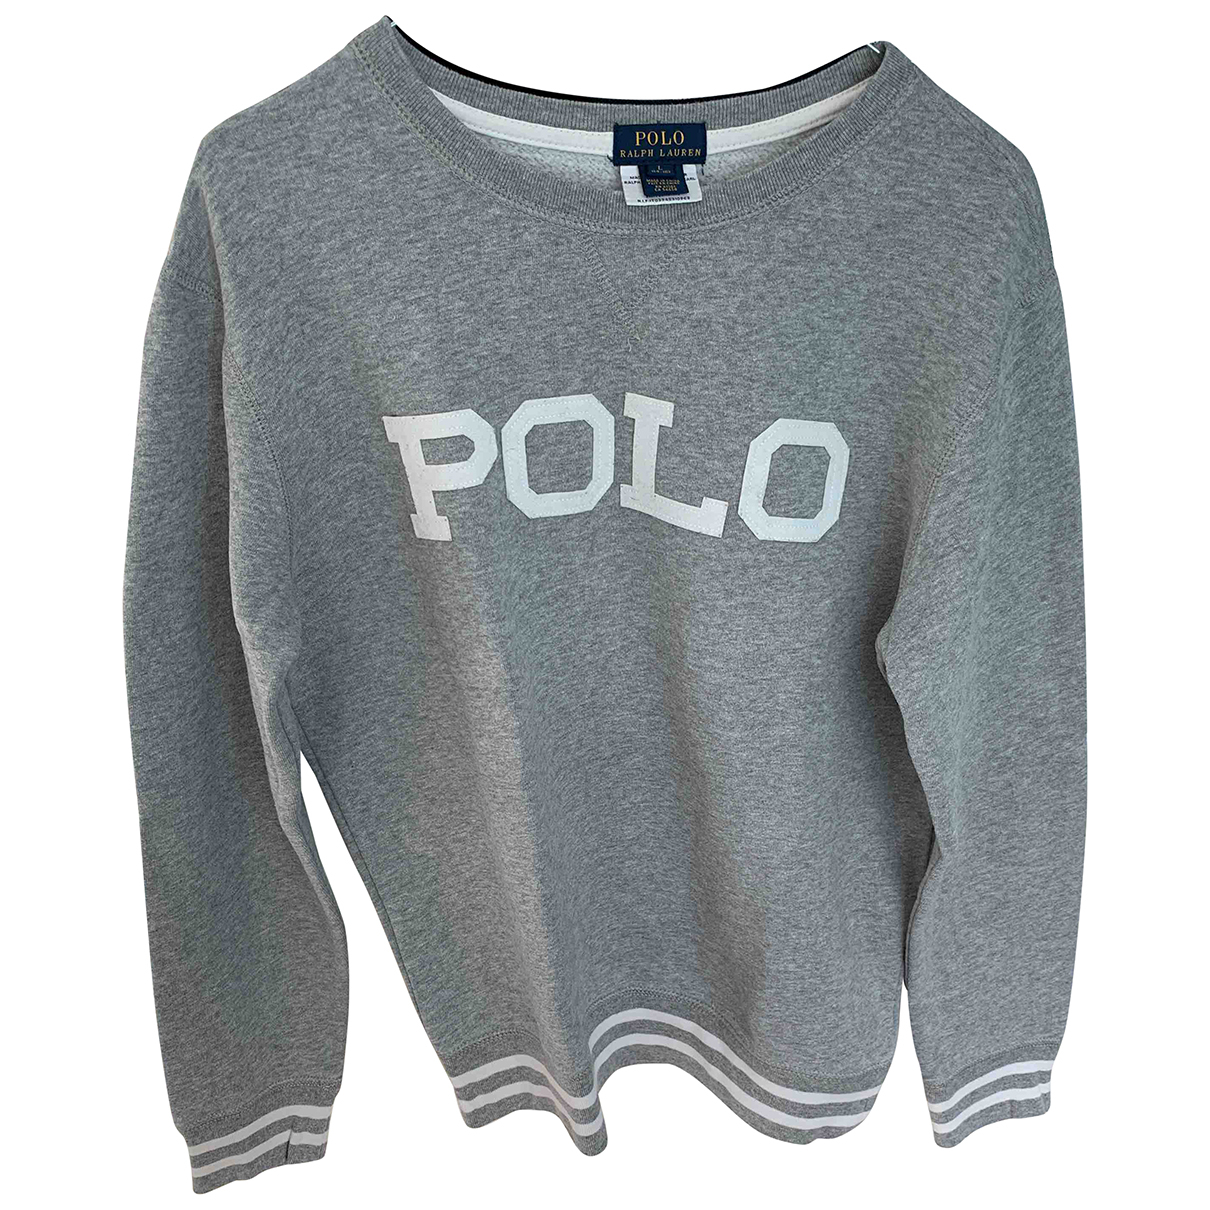 Polo Ralph Lauren N Grey Cotton Knitwear for Kids 18 years - L FR